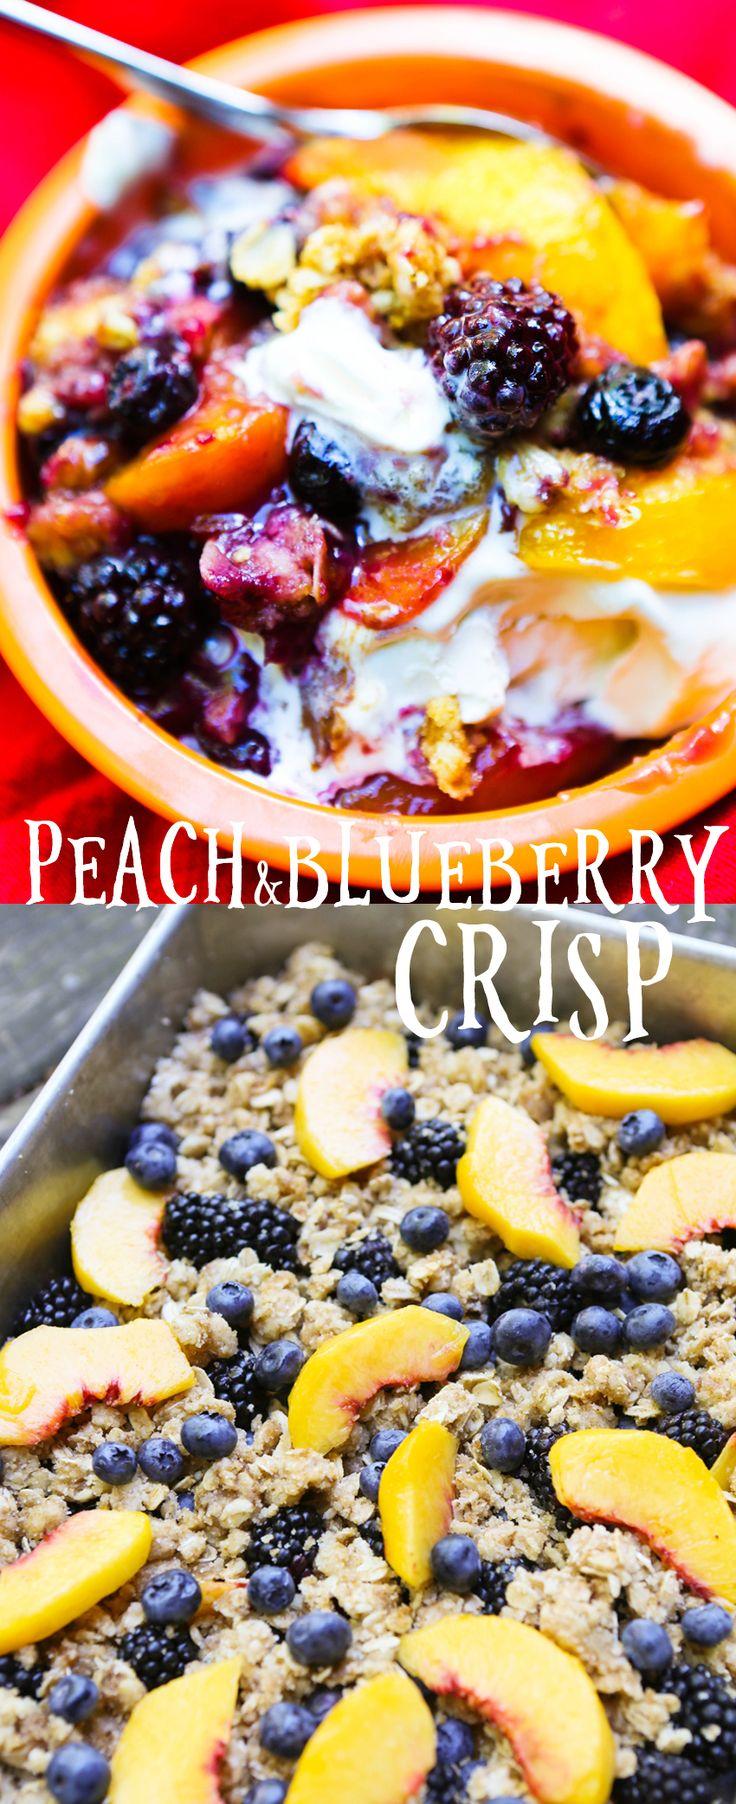 25+ best ideas about Peach Blueberry Crisp on Pinterest ...